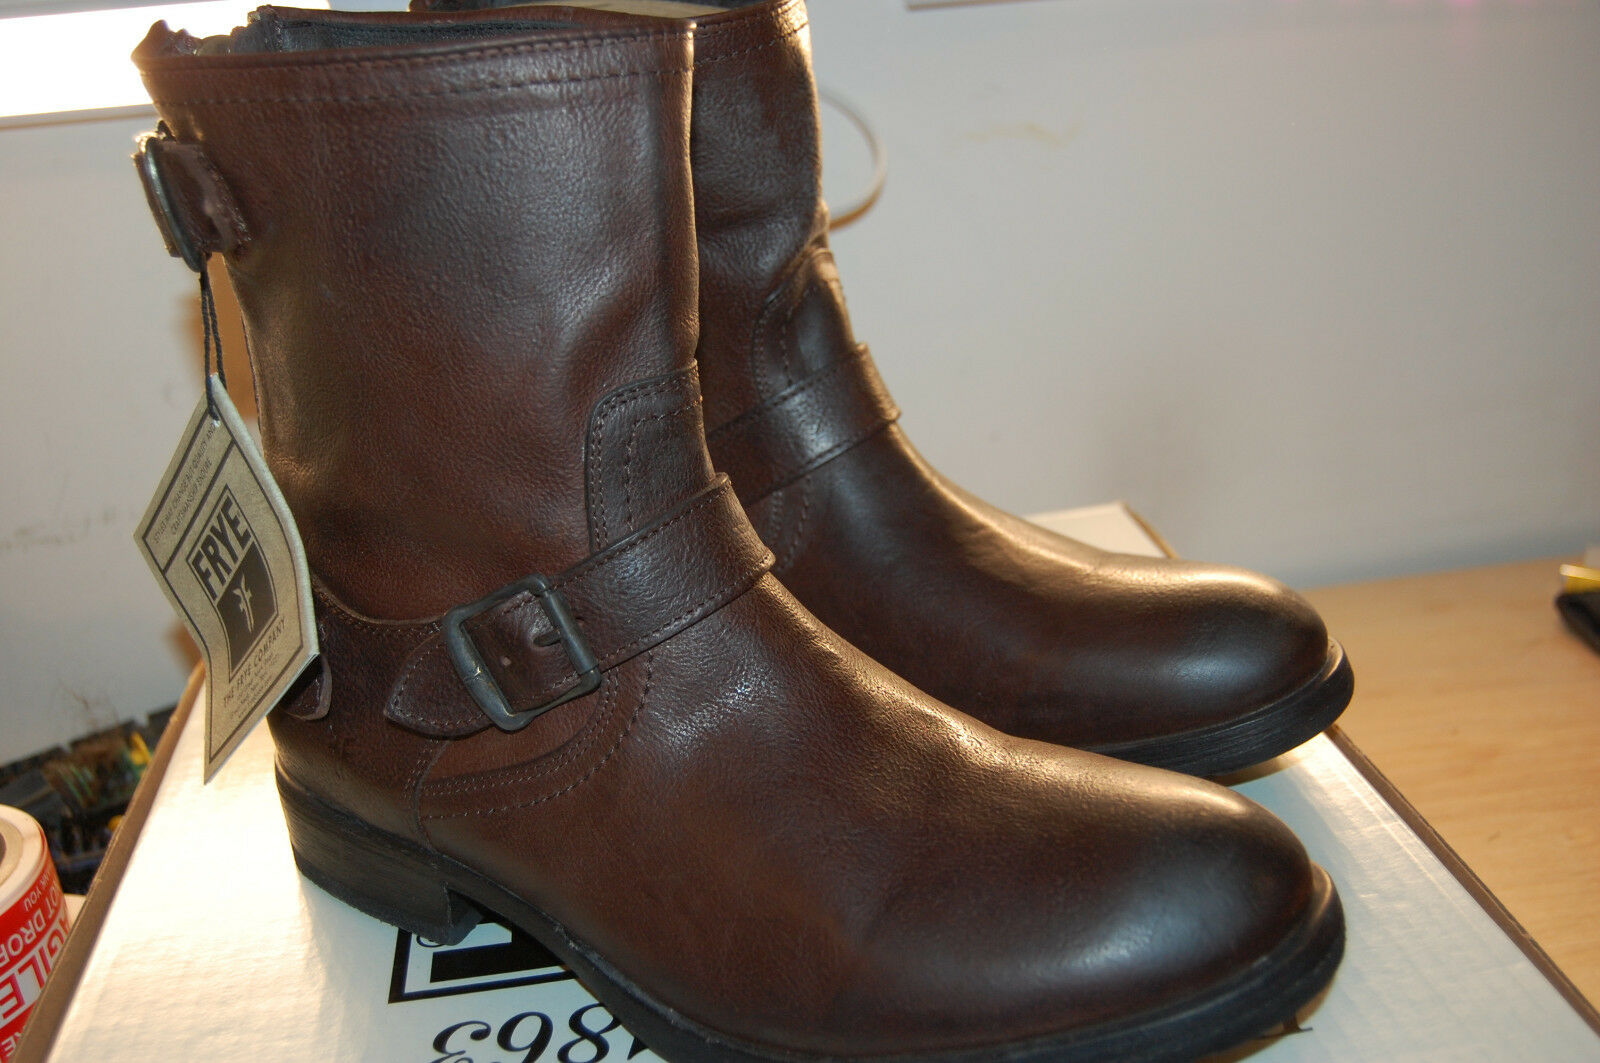 NIB Frye Dean Zip Short  full full full grain Hammered leather Dark Brown Stivali Lined 10 M c50b37